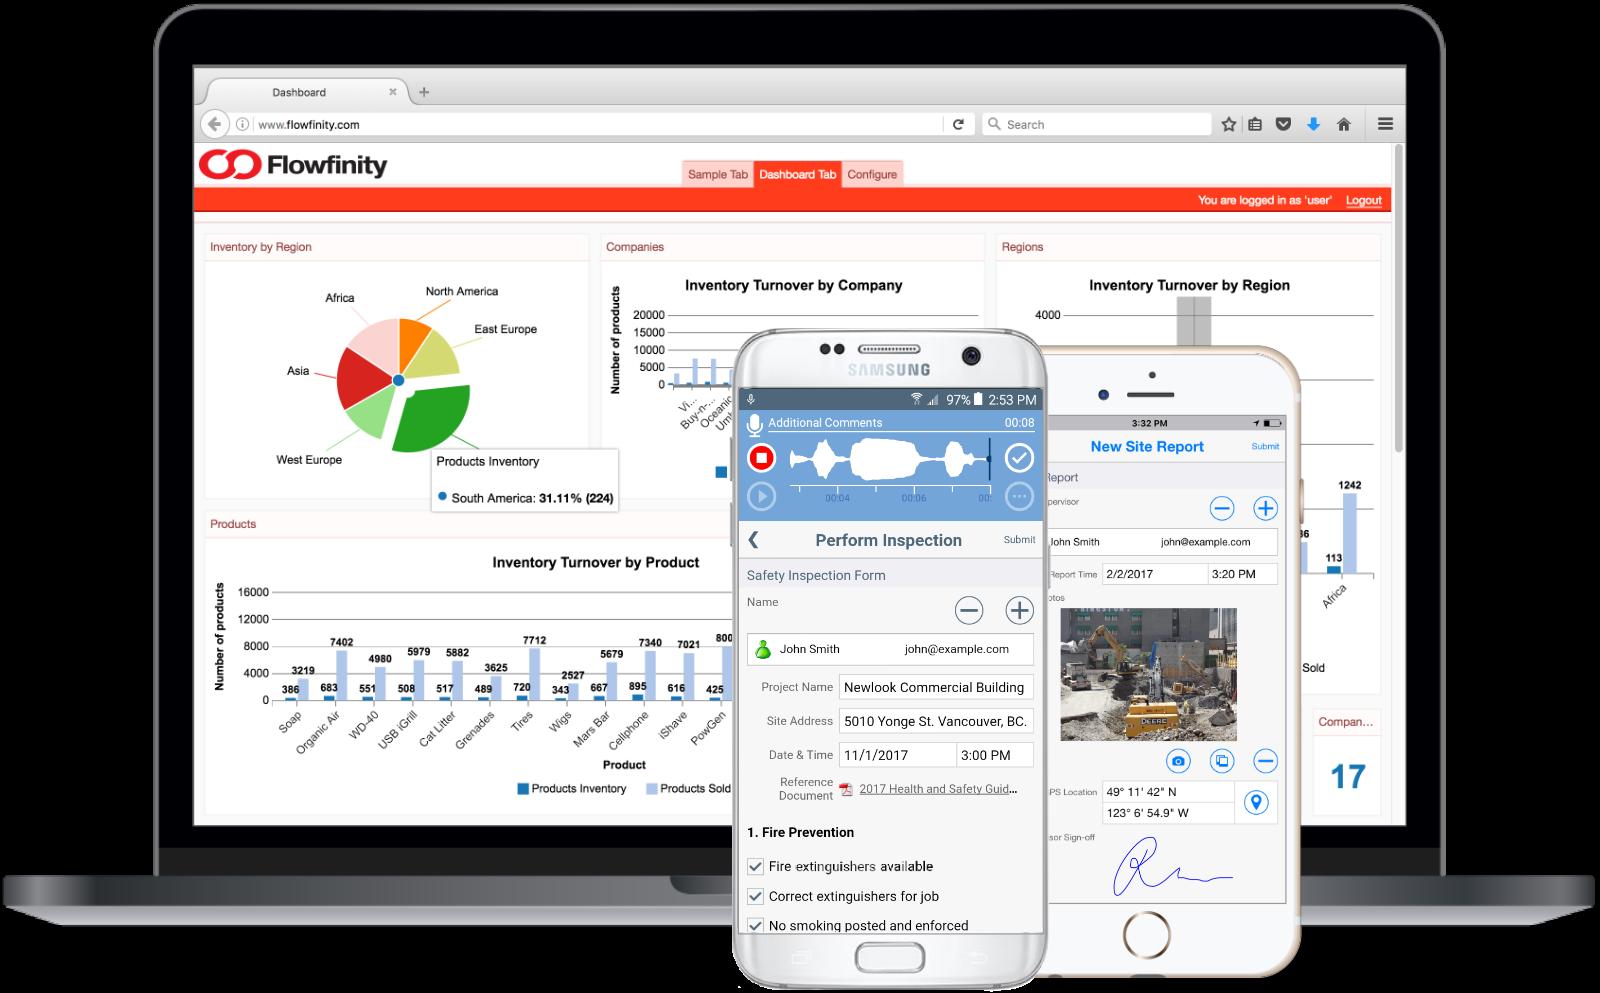 Flowfinity Software - 4